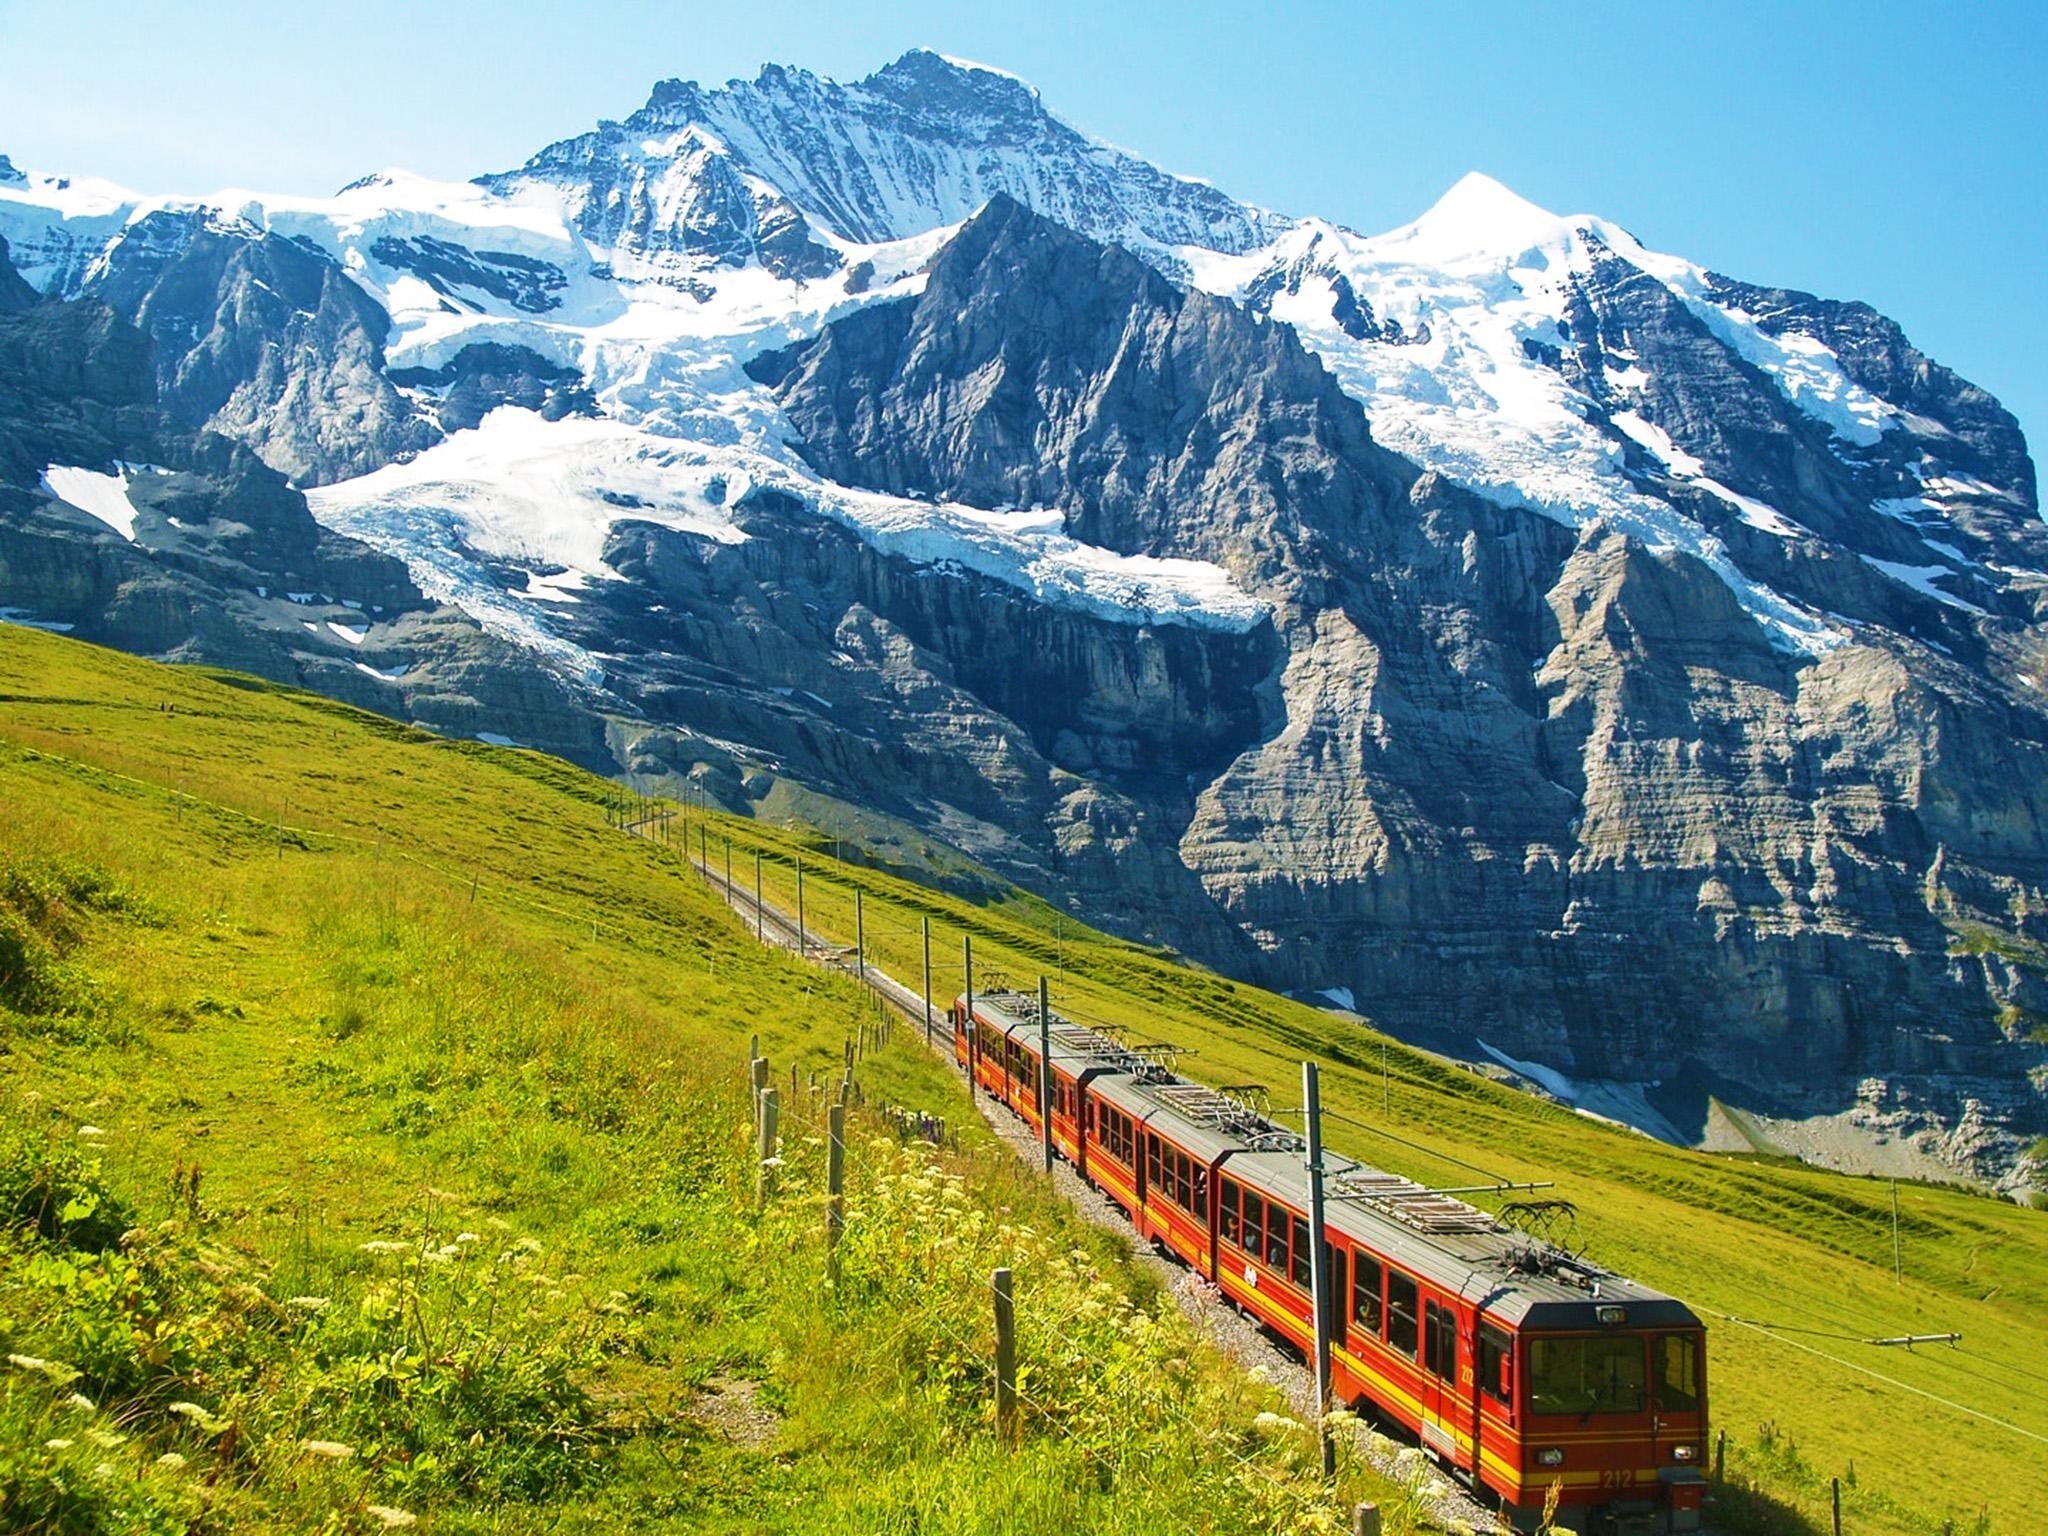 kt_2020_360_Keytours_excursions_Swisstours_interlaken_jungfraujoch1_2048_10